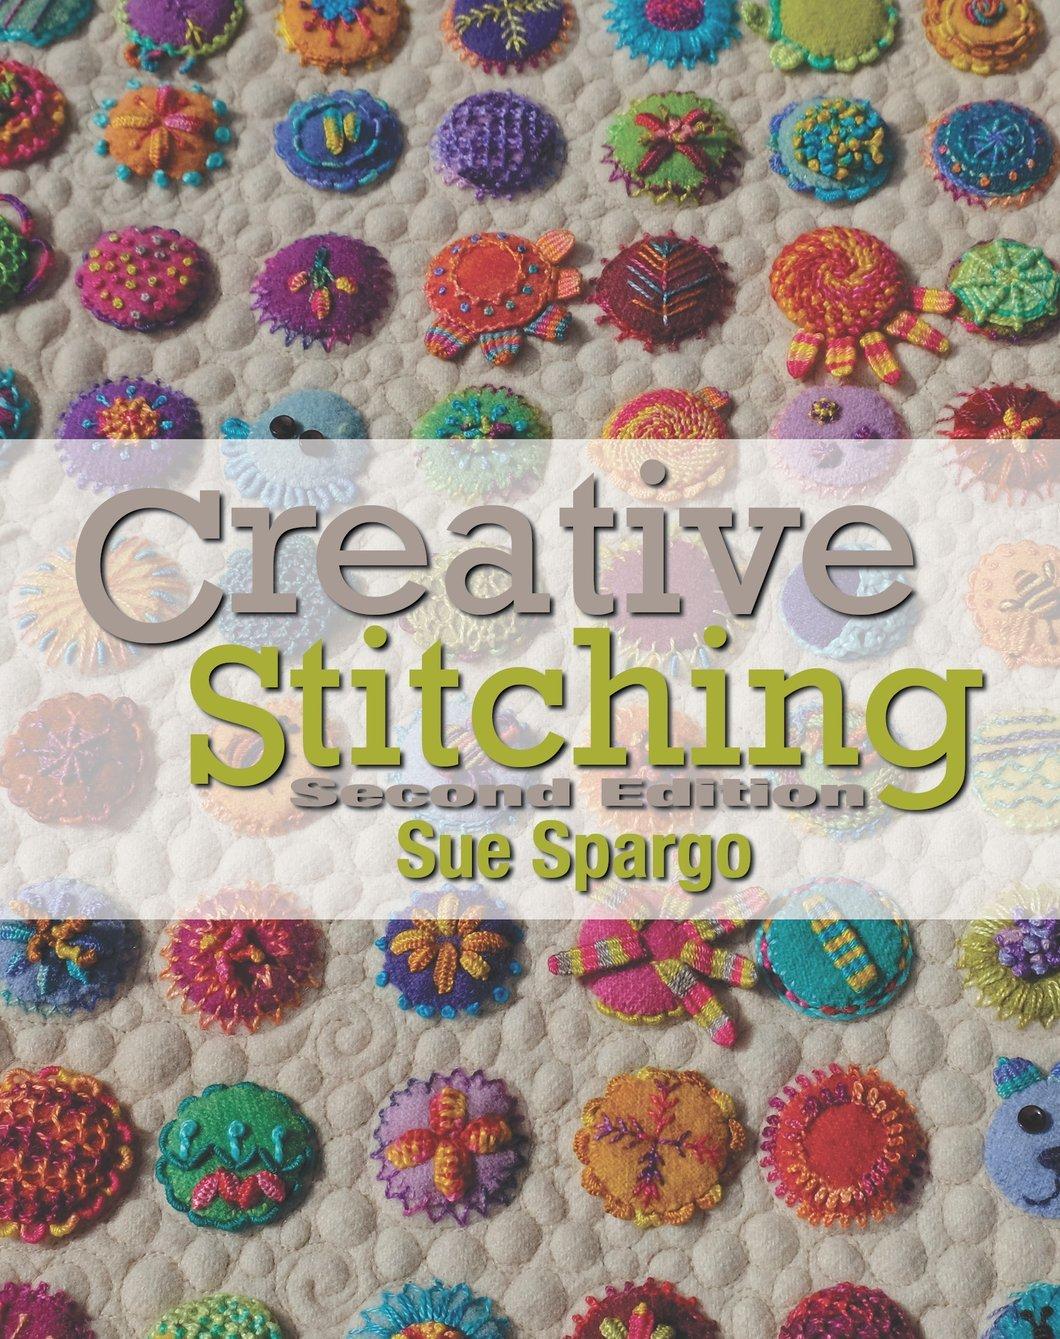 Book. Creative Stitching NEW 2nd Edition by Sue Spargo